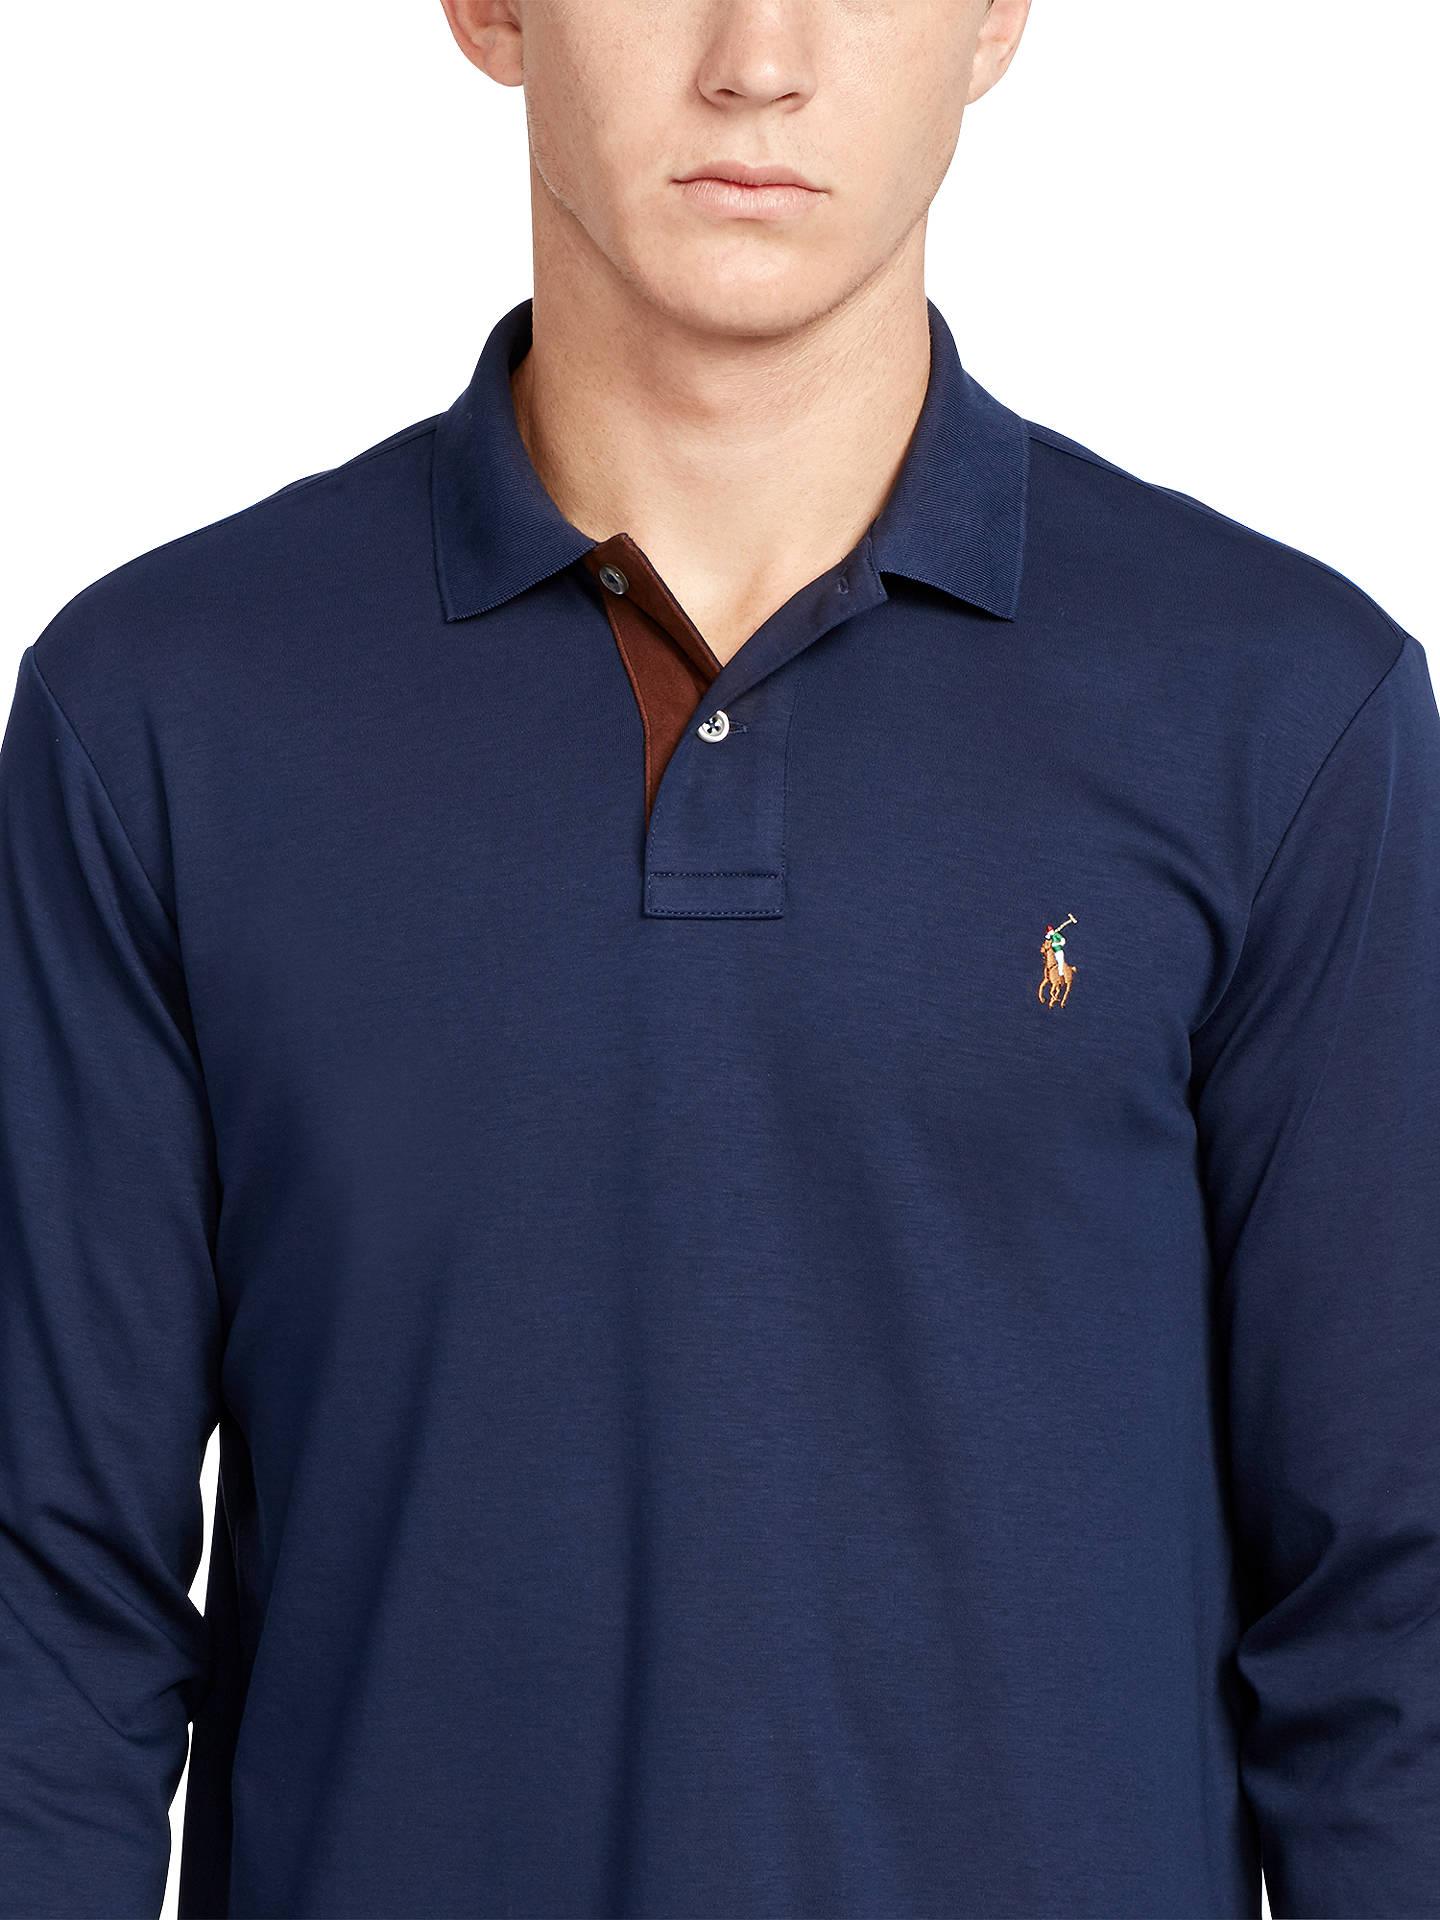 At Sleeve Pima Long Polo Cotton Shirt Ralph Custom Fit Lauren YbEH29WDeI